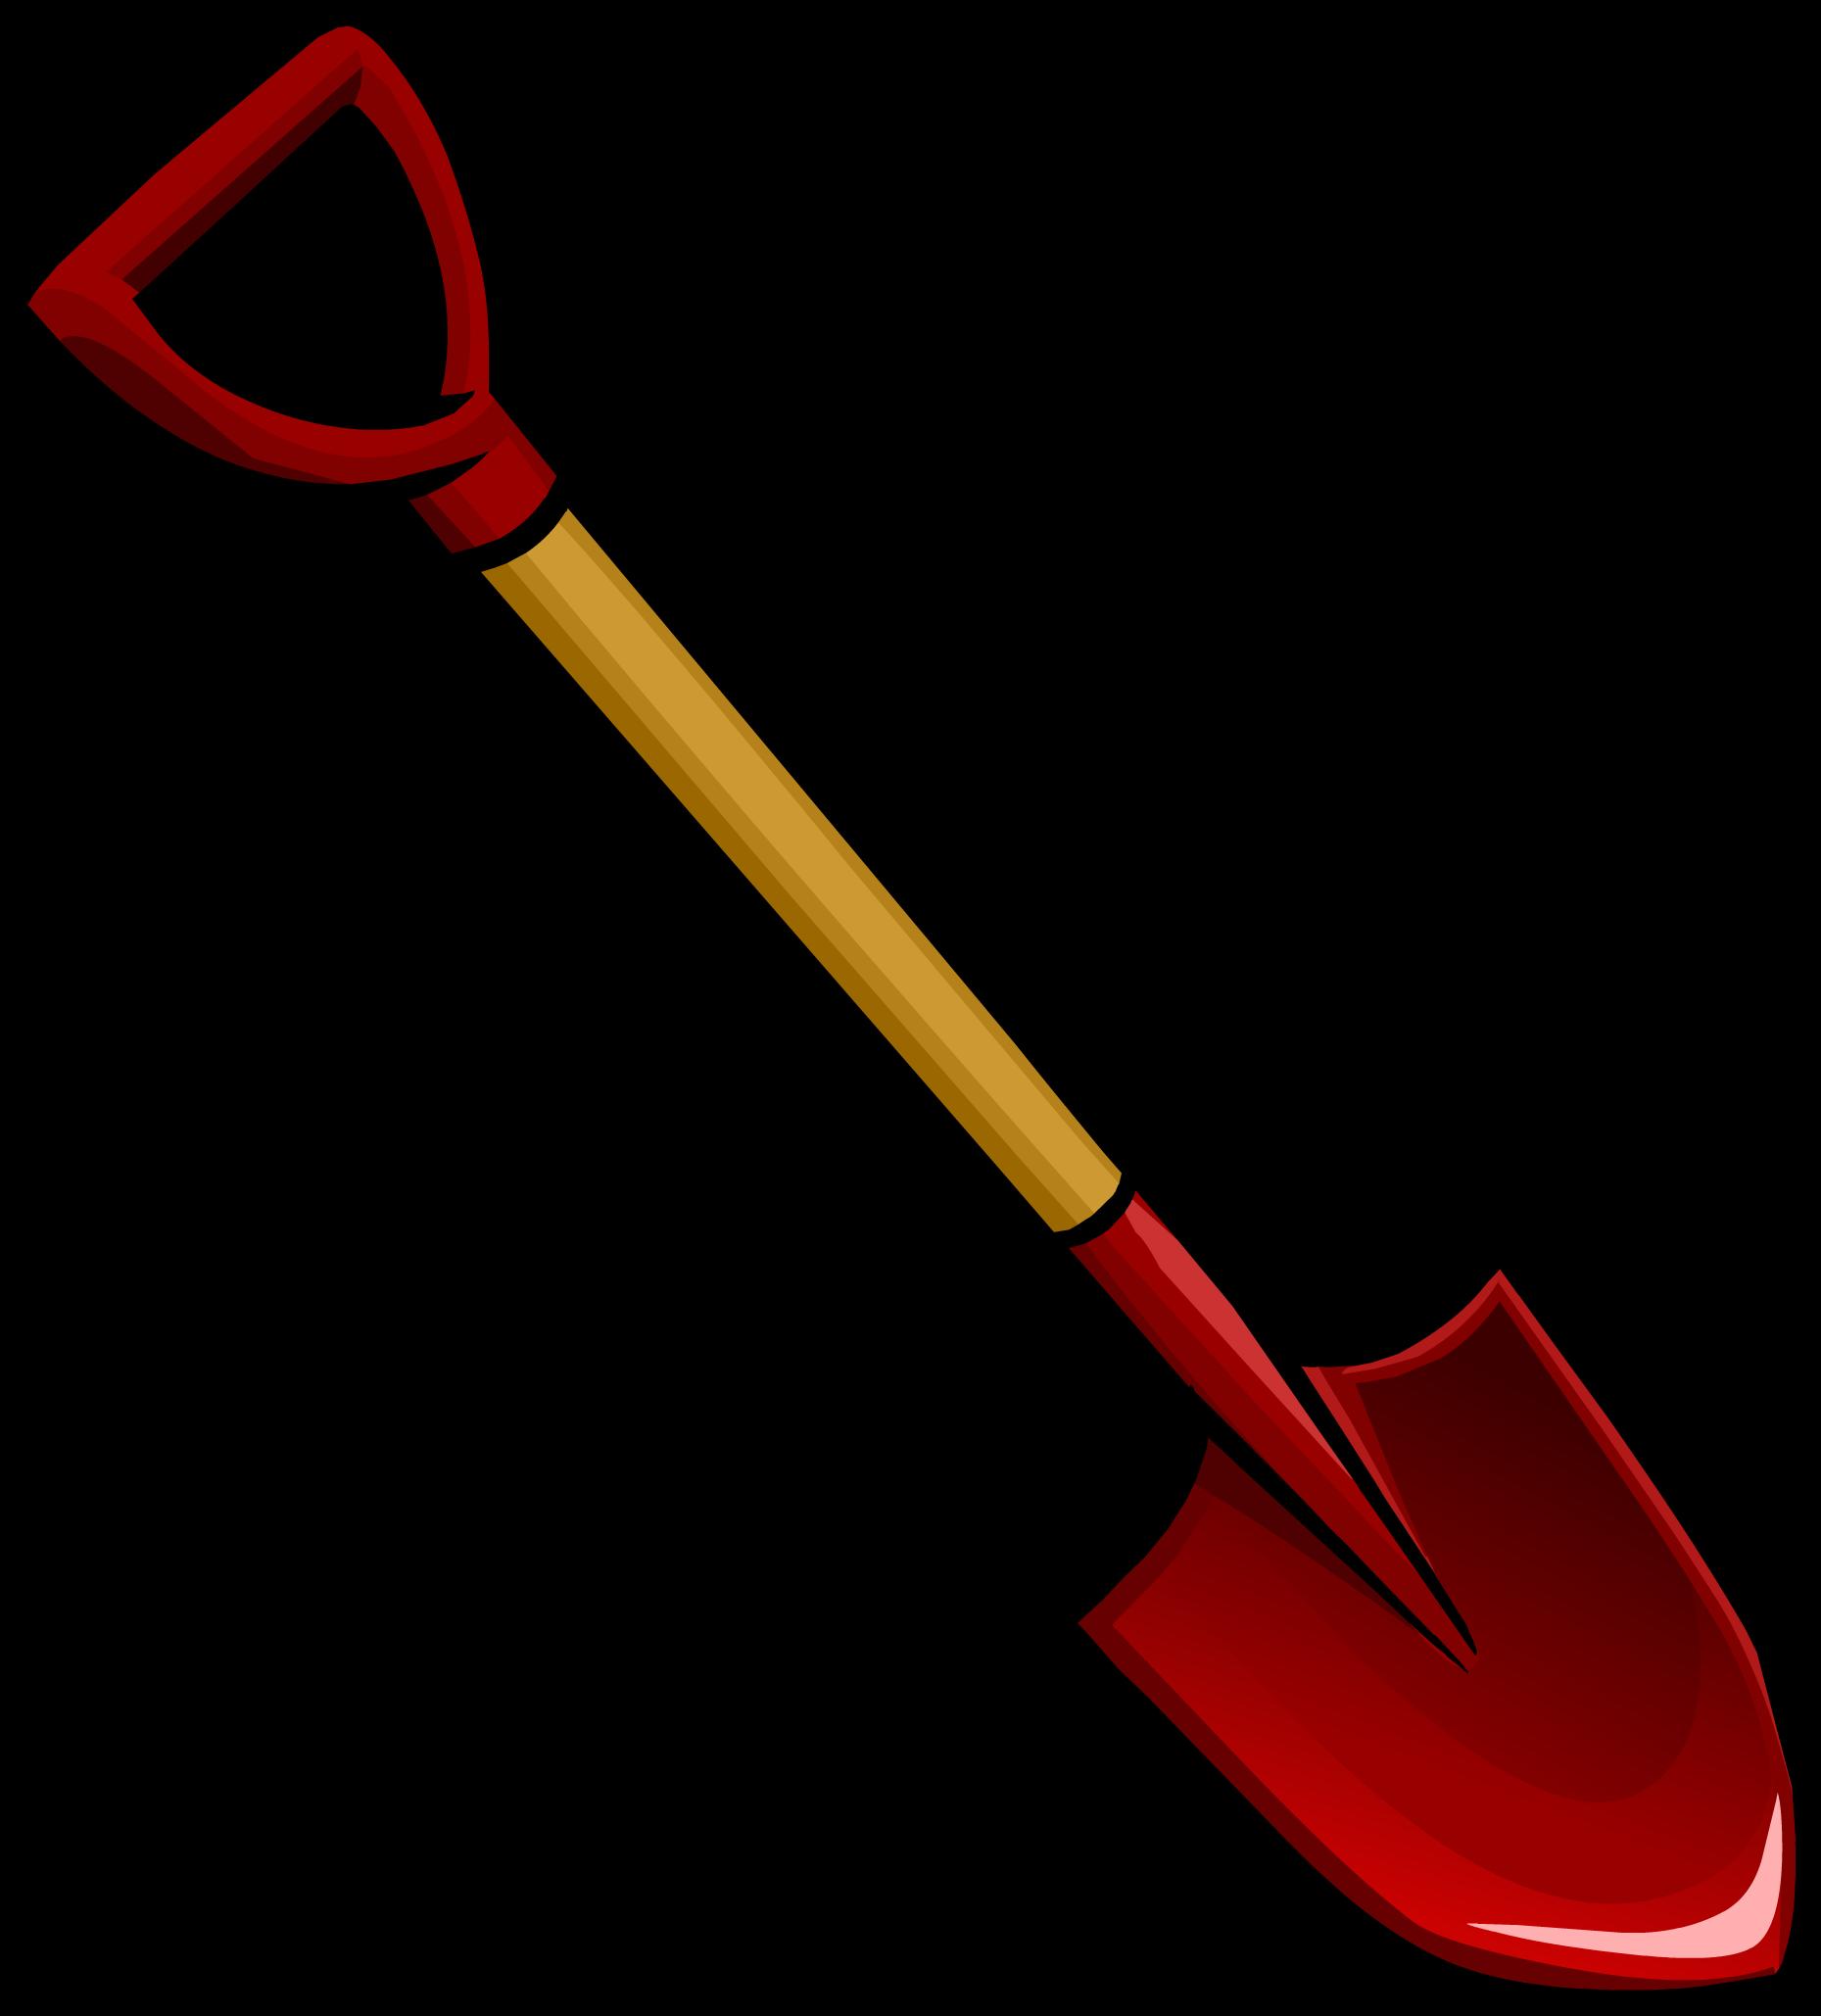 png free stock Name clipart gardening tool. Shovel .